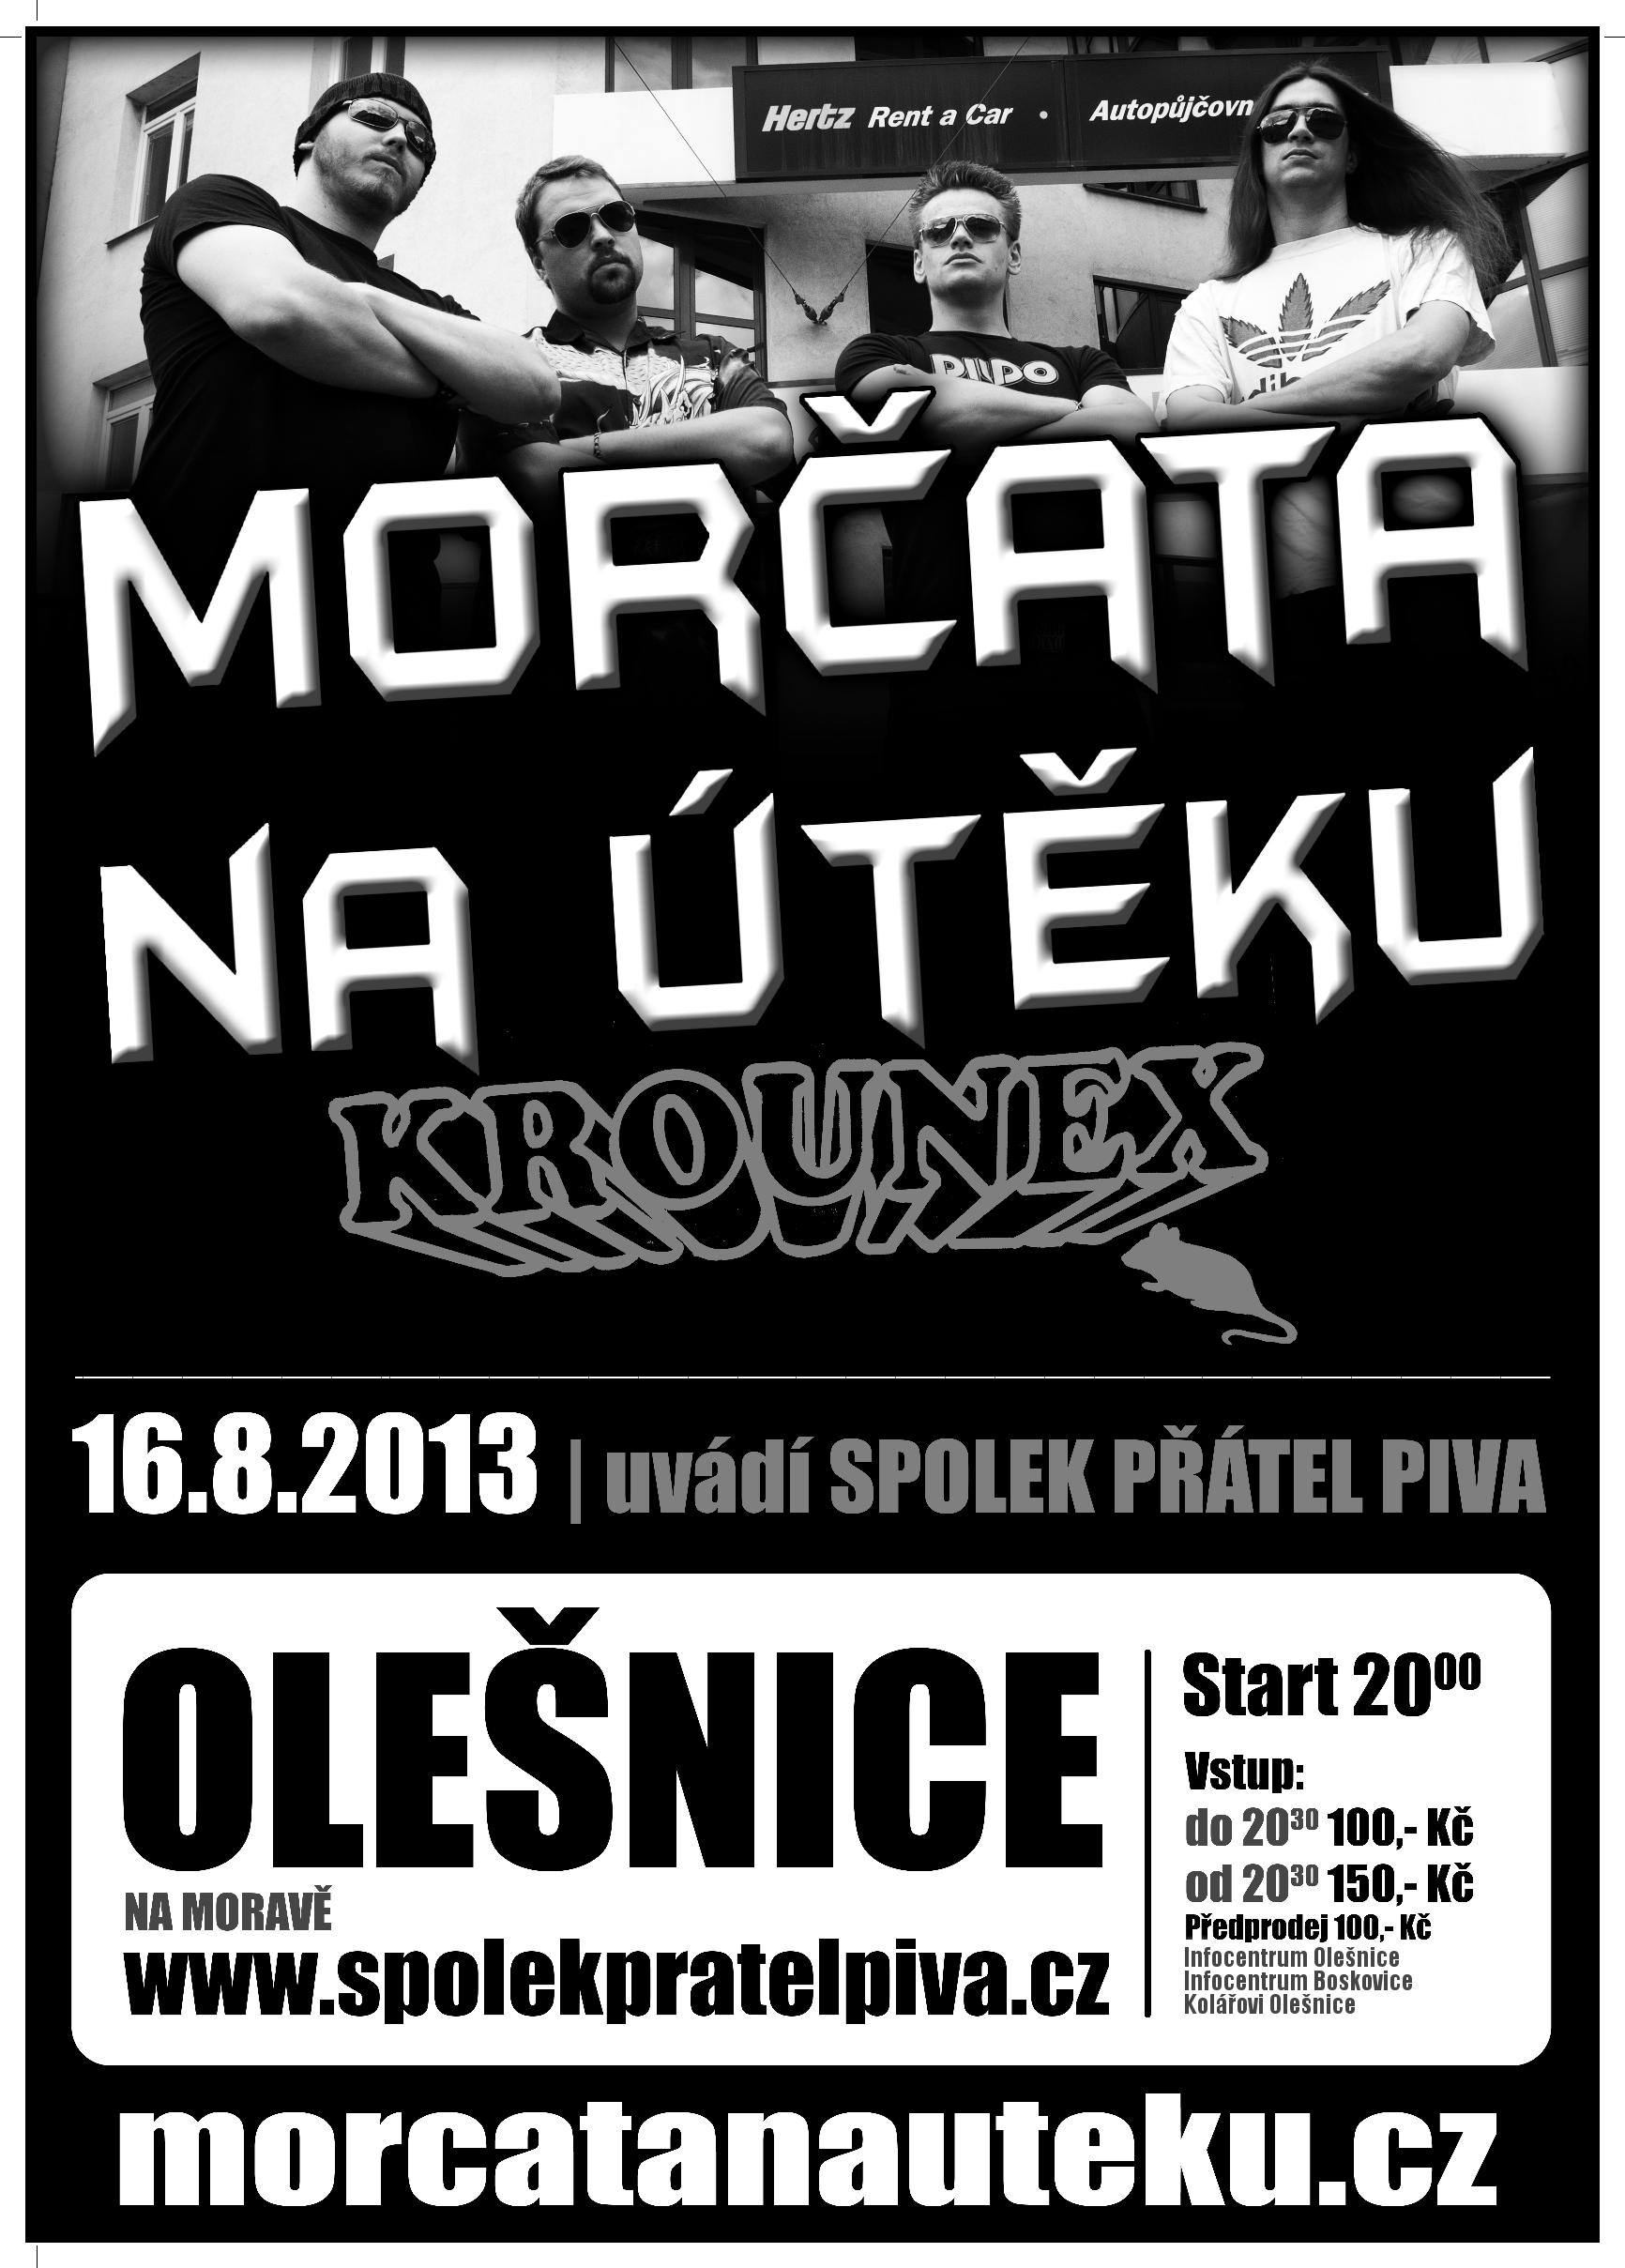 Plakát: Morčata na útěku + Krounex.